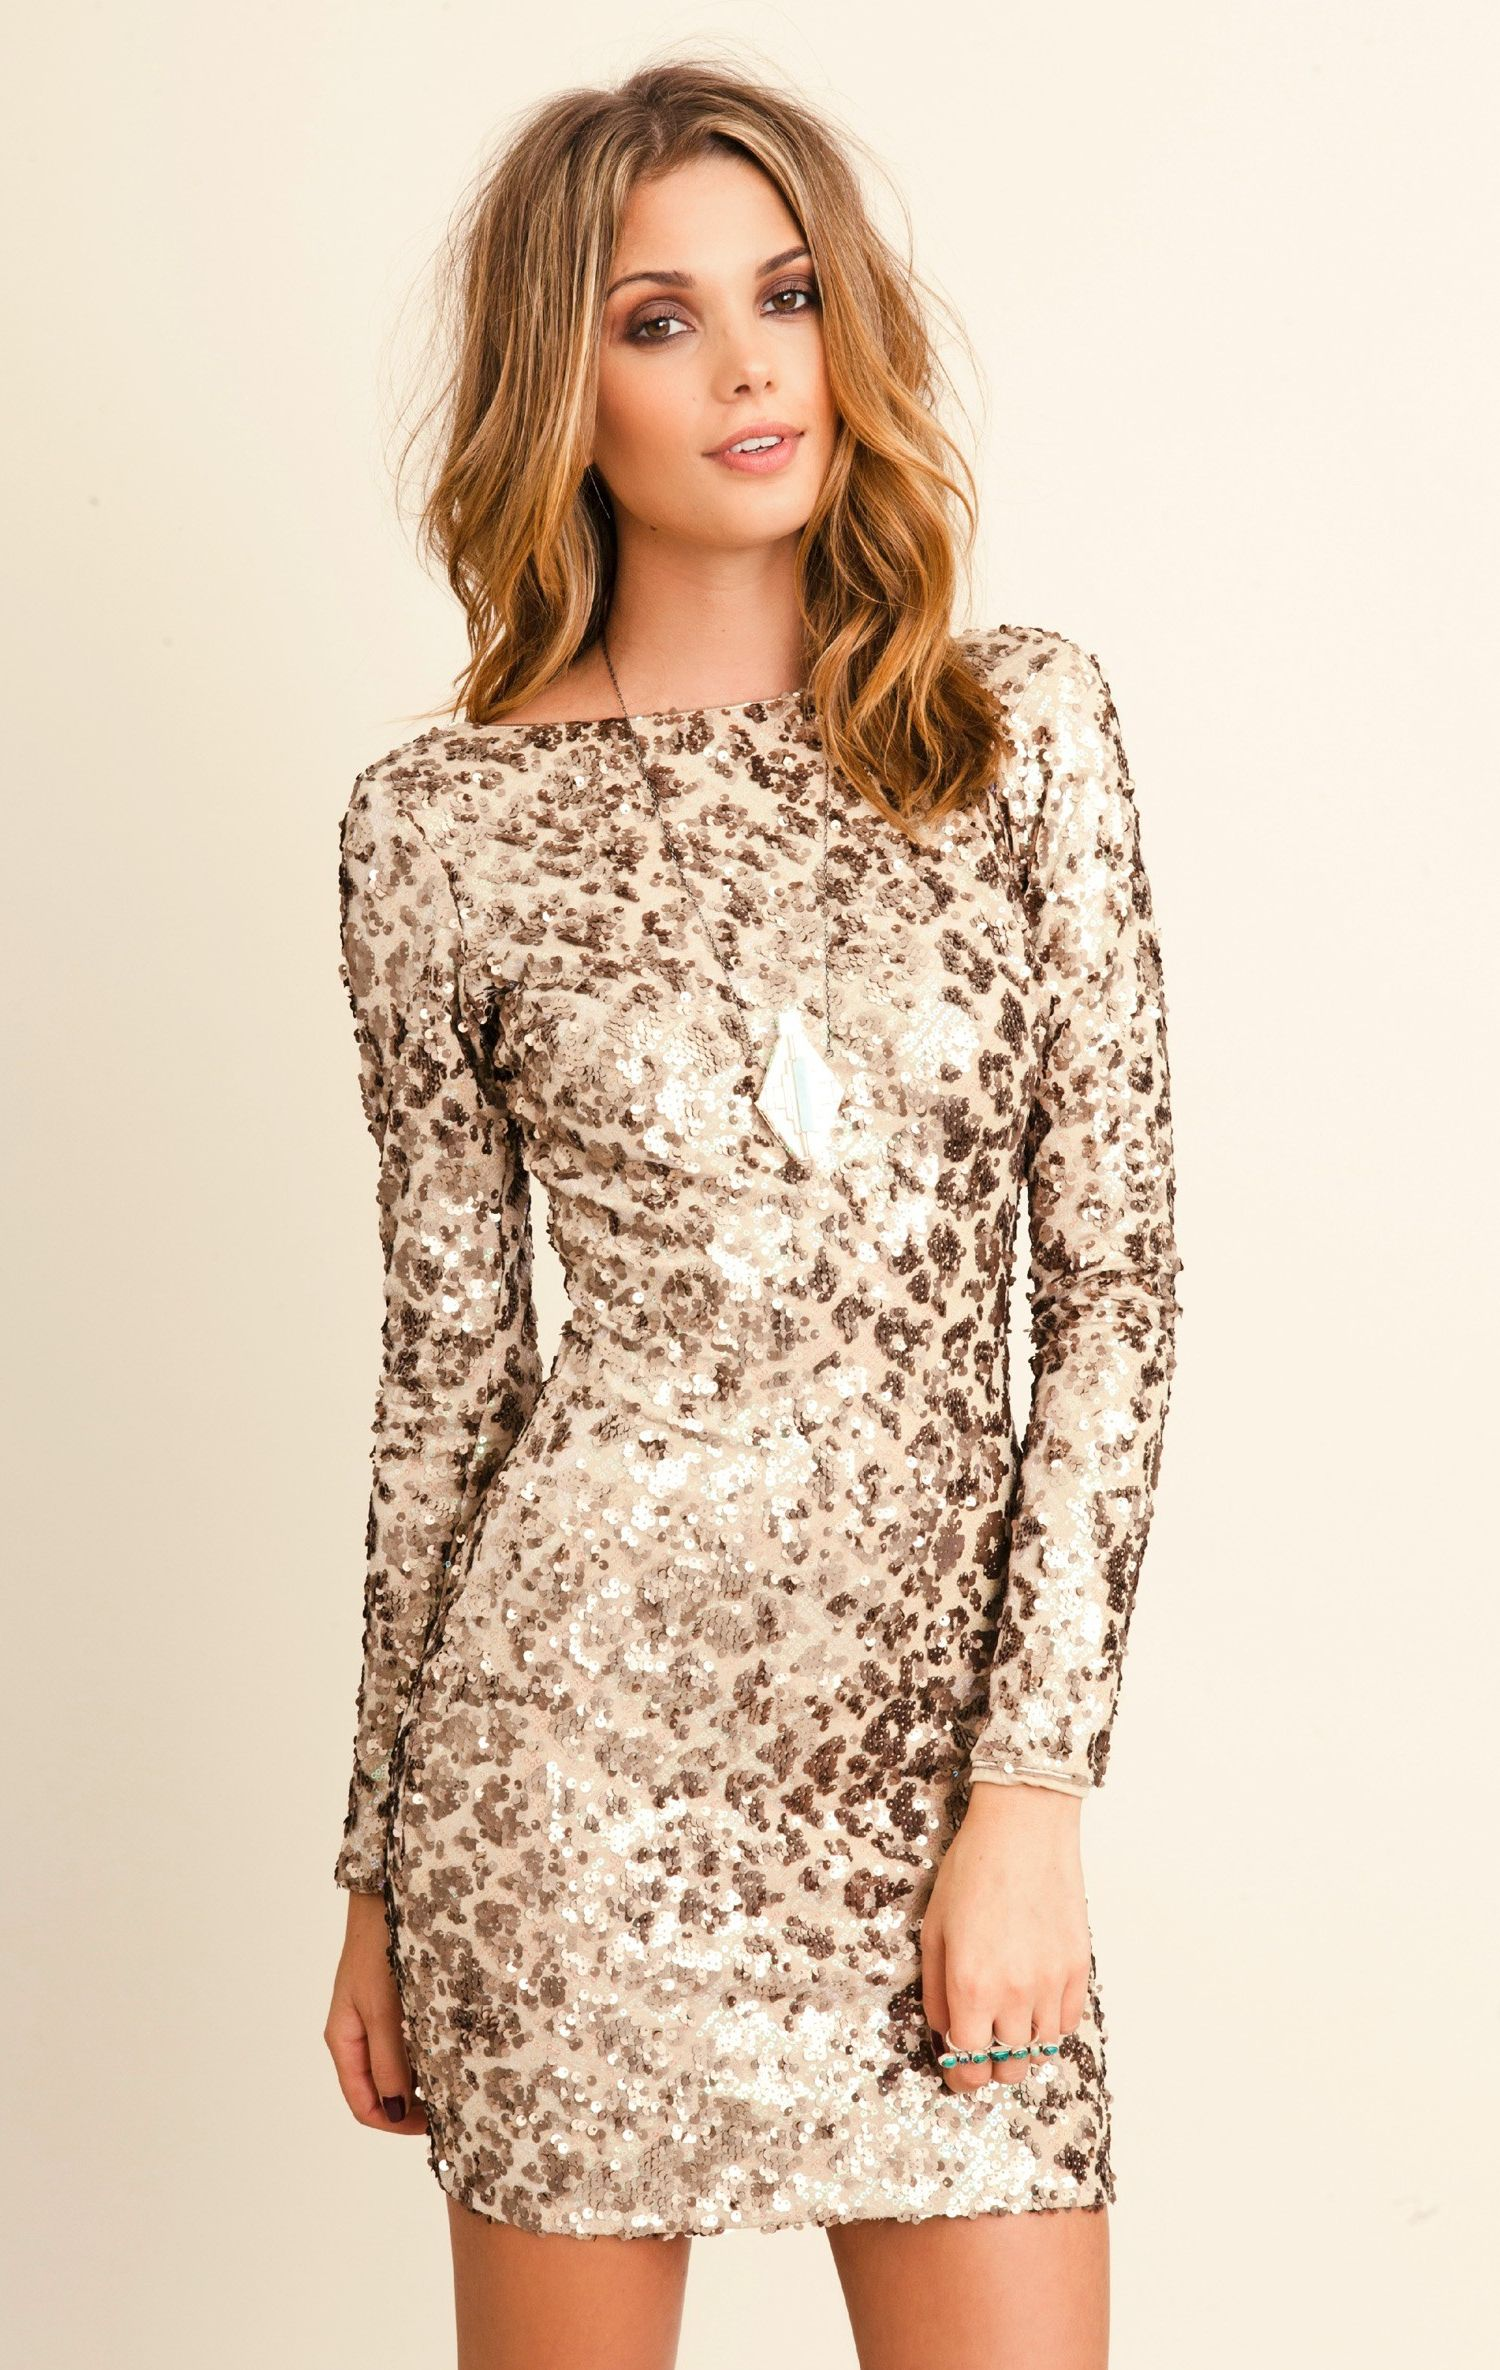 Long Sleeve Sequin Dress Knee Length | LongSleeve Dress | Pinterest